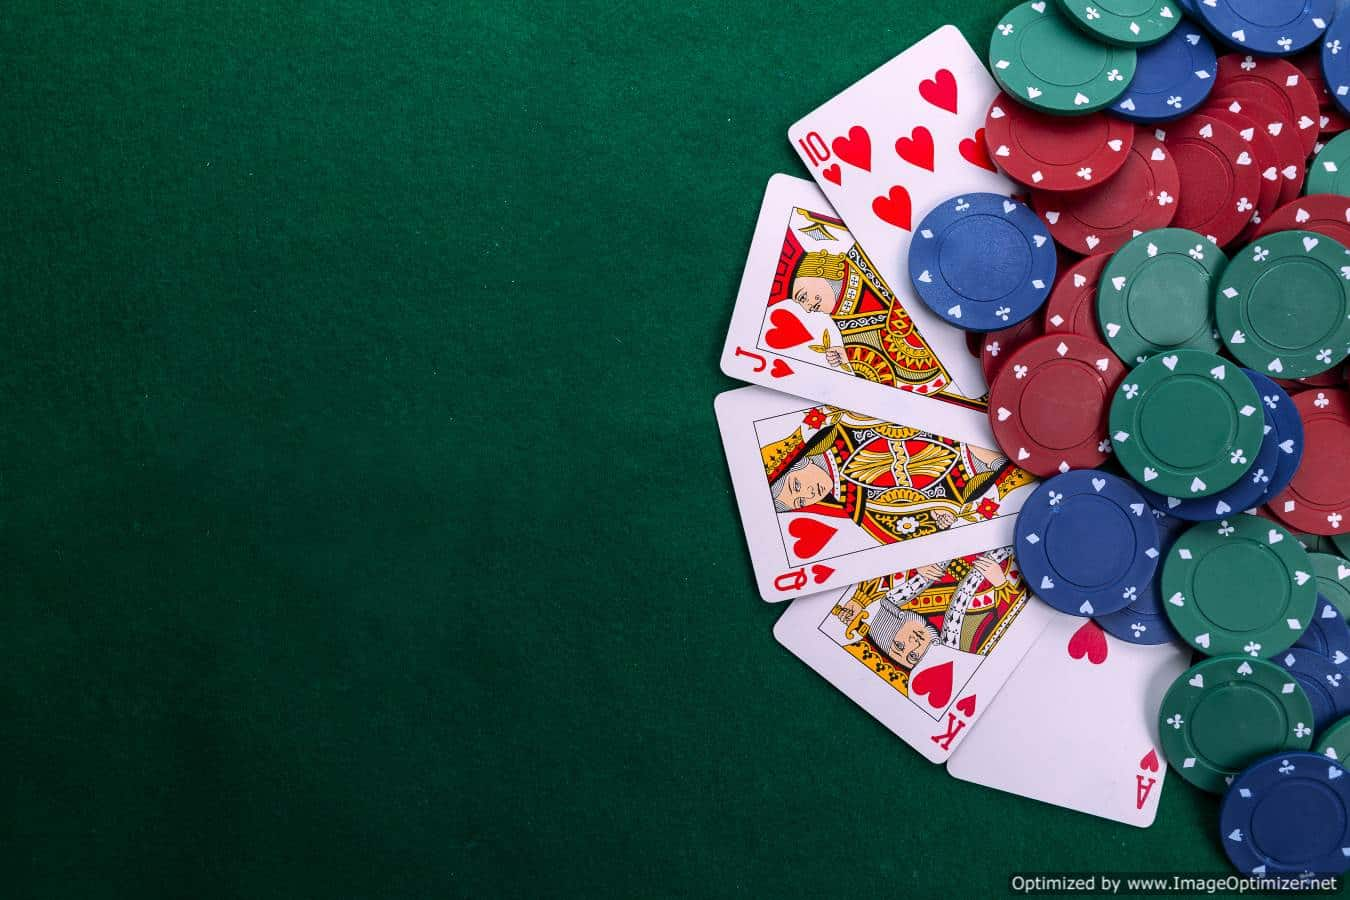 willkommenbonus im online casino